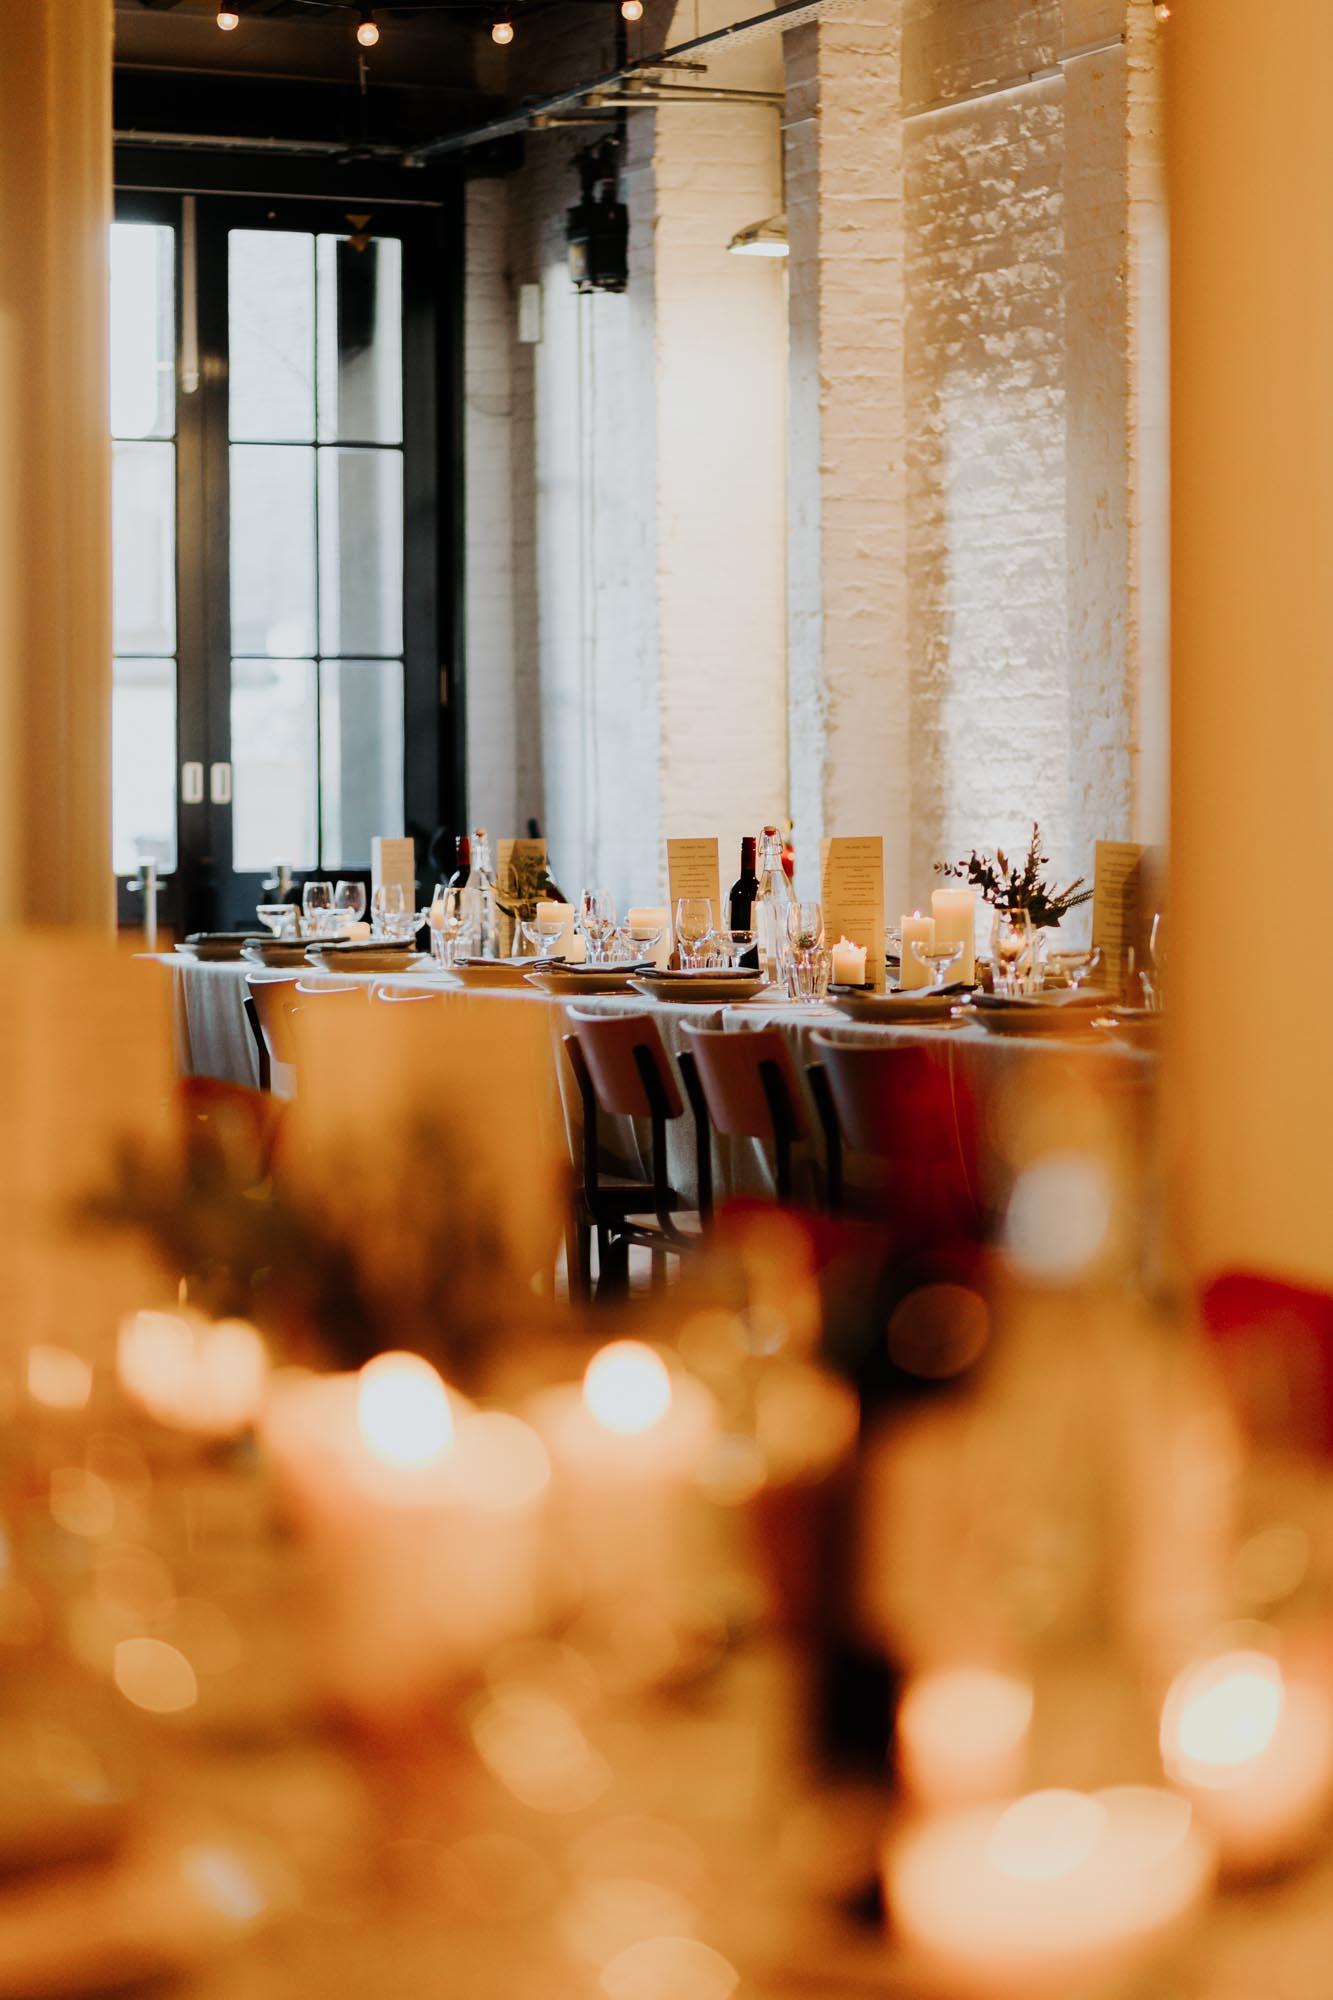 Quirky Venue, Non-traditional wedding planner, London Wedding coordination, Event Bar, Bespoke weddings, Brixton East 1871 Wedding, Airstream, informal, Stylish, Drag Queen